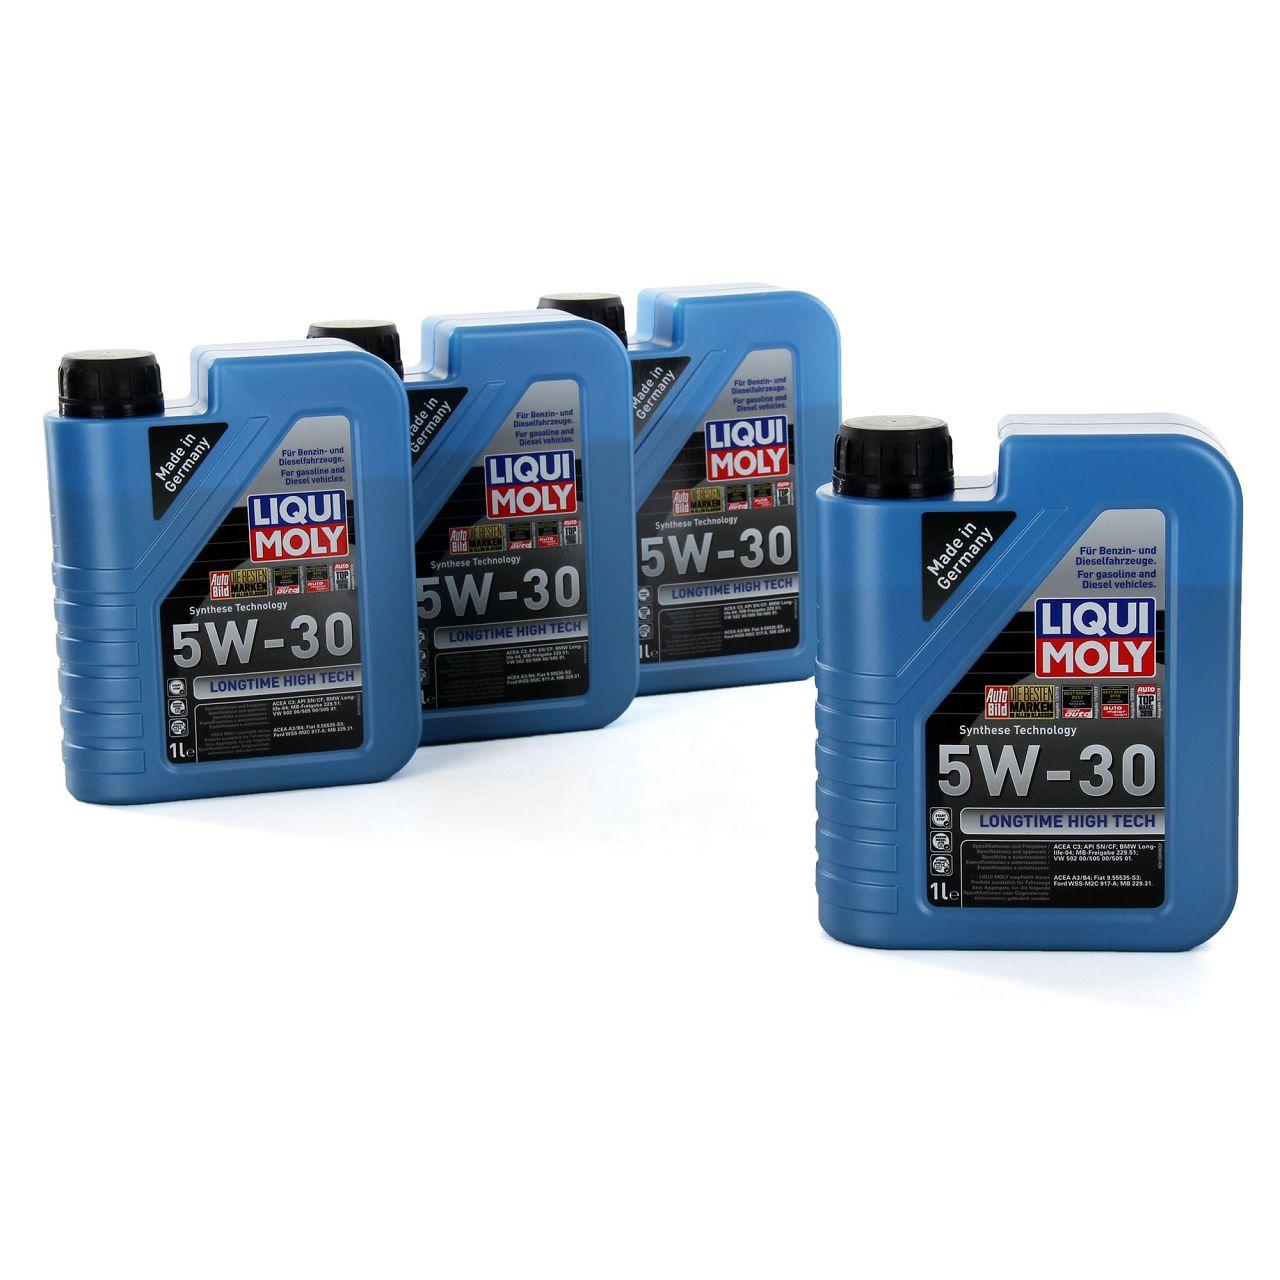 LIQUI MOLY Motoröl Öl LONGTIME HIGH TECH 5W30 5W-30 4L 4Liter 1136